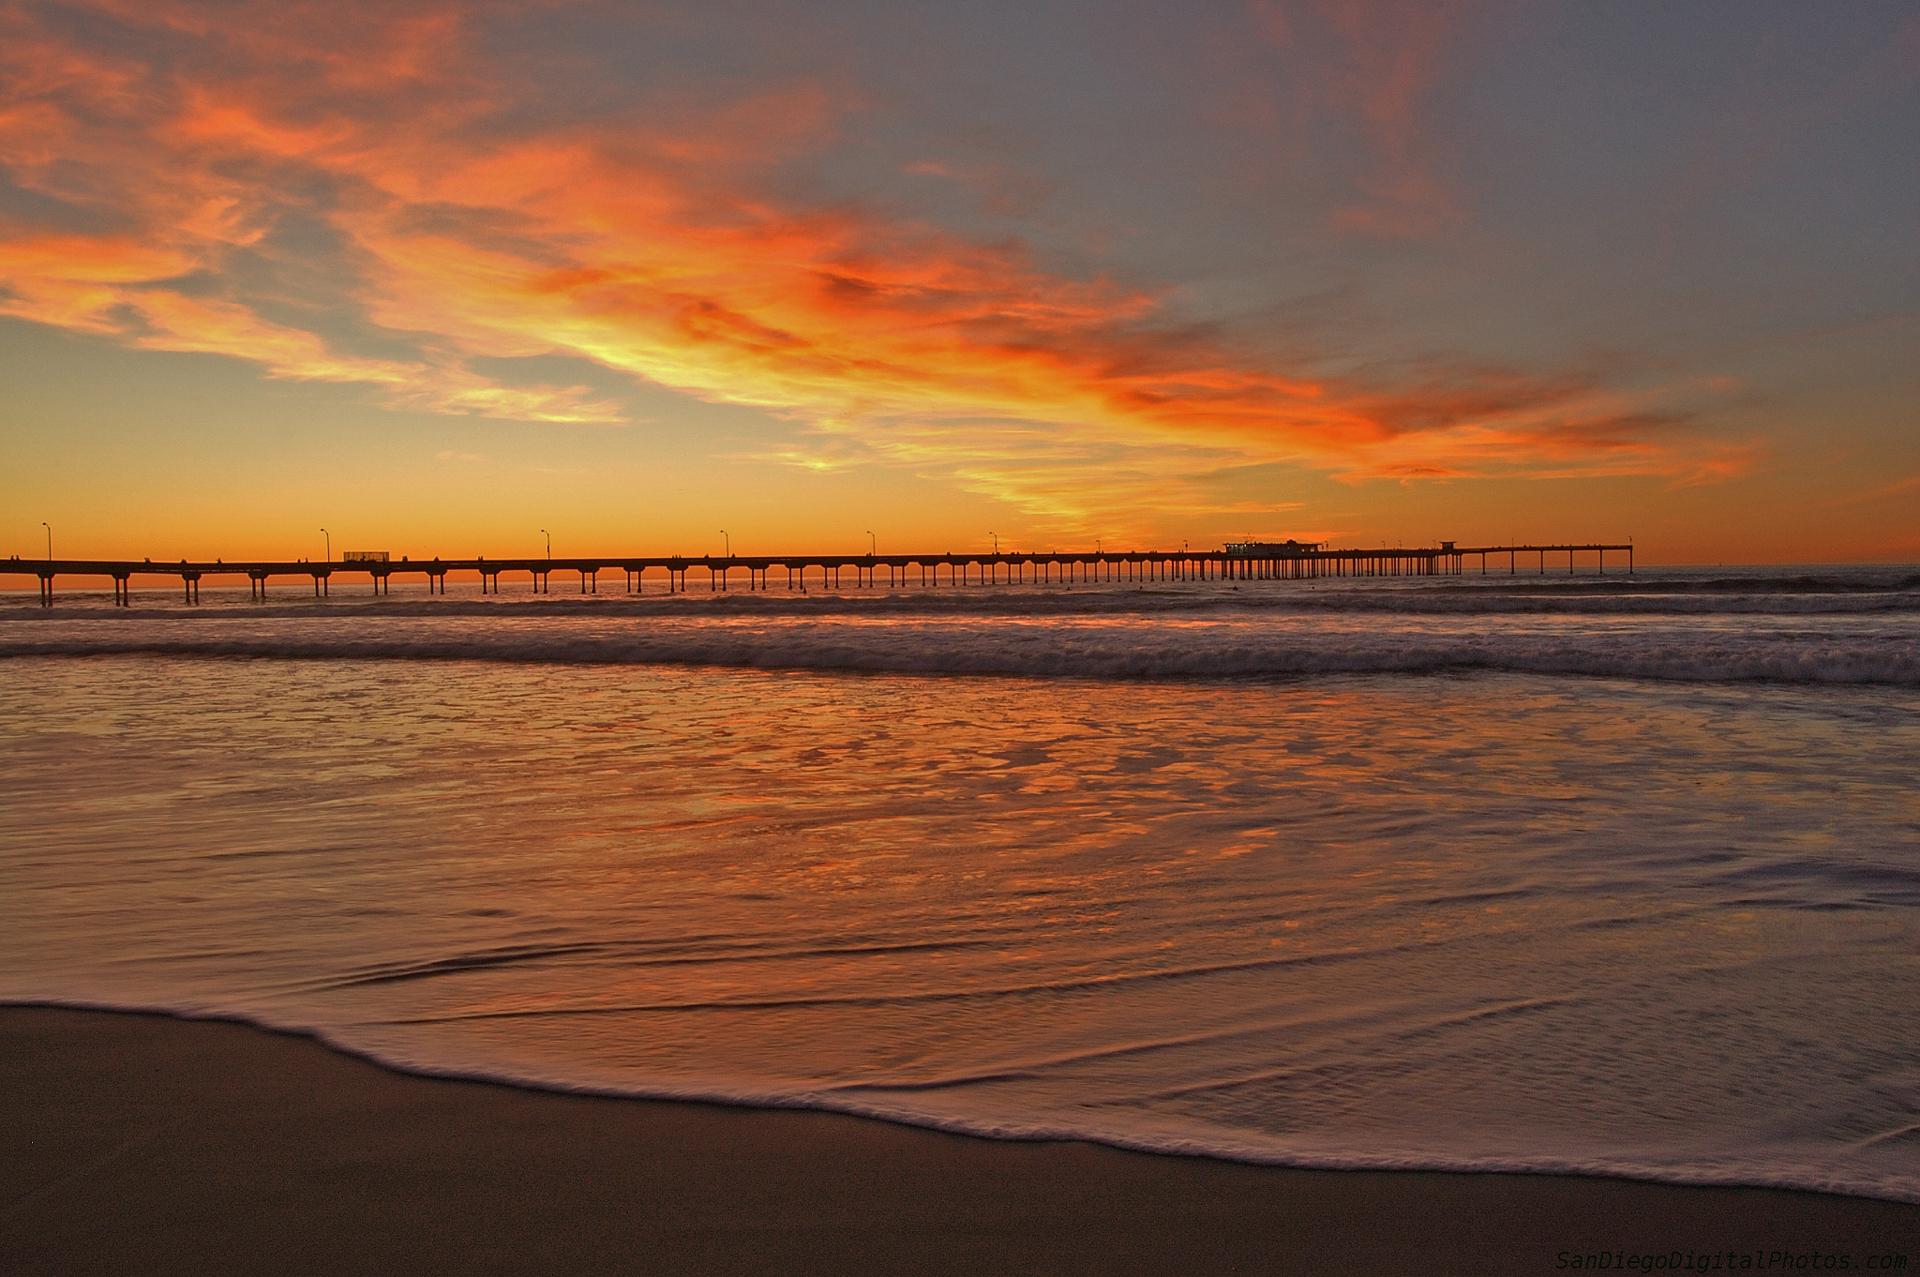 sunset beach san - photo #2